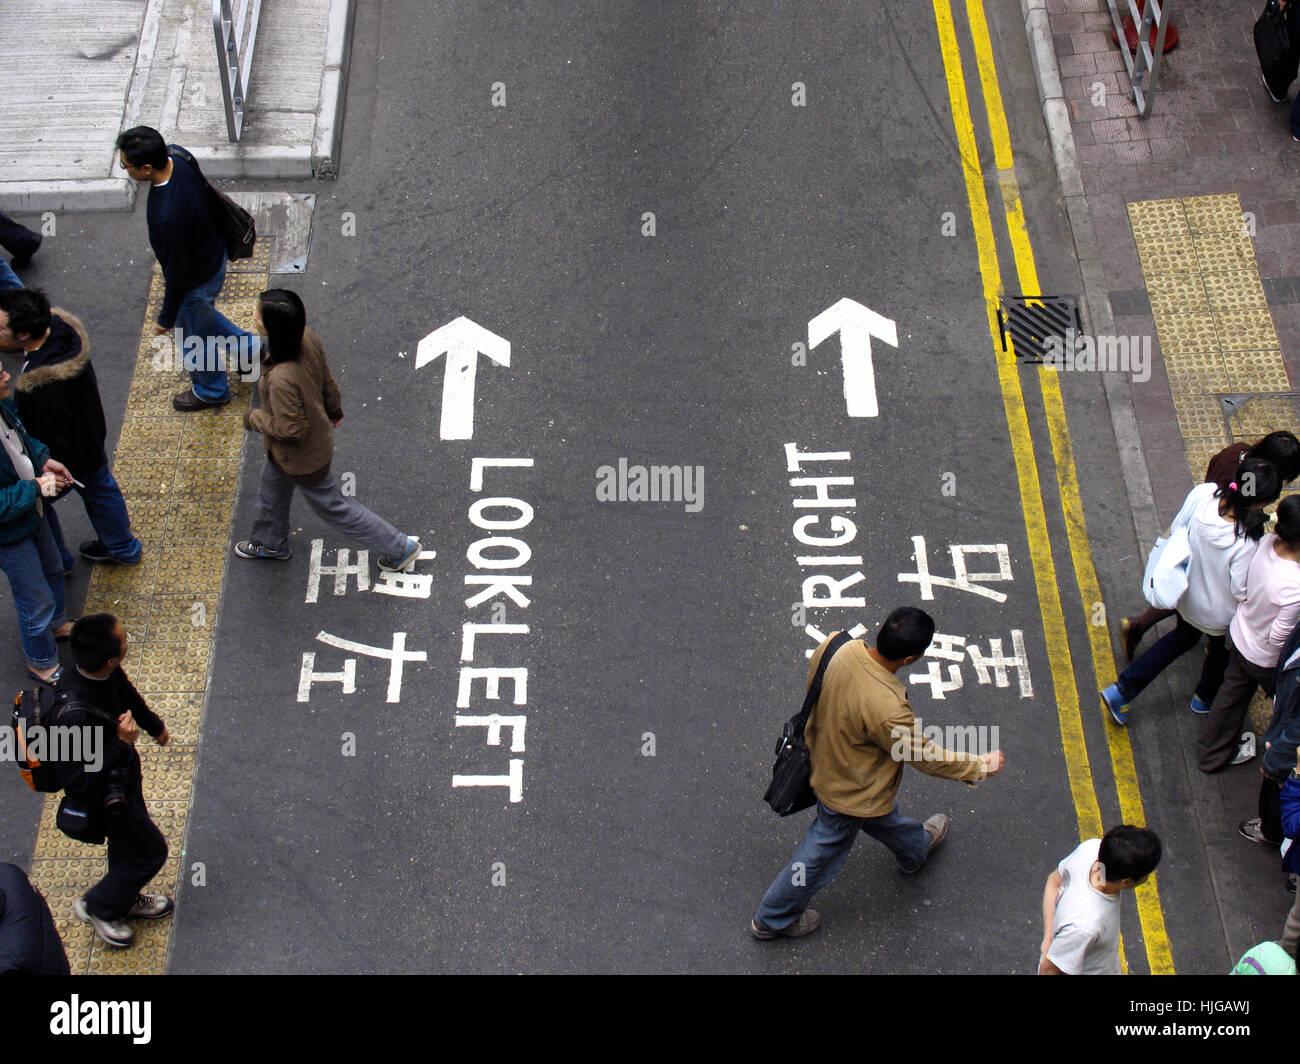 Traffic indications on the street, Hongkong, China, Asia - Stock Image